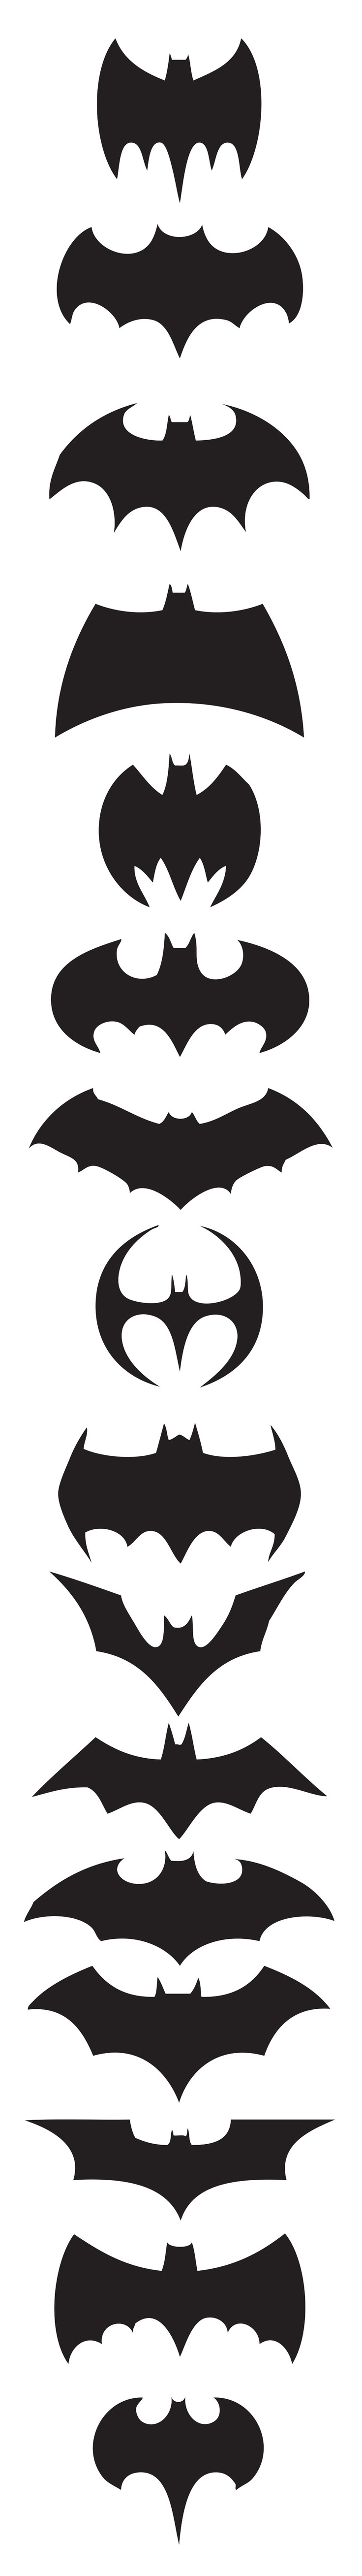 The history of the Batman logo